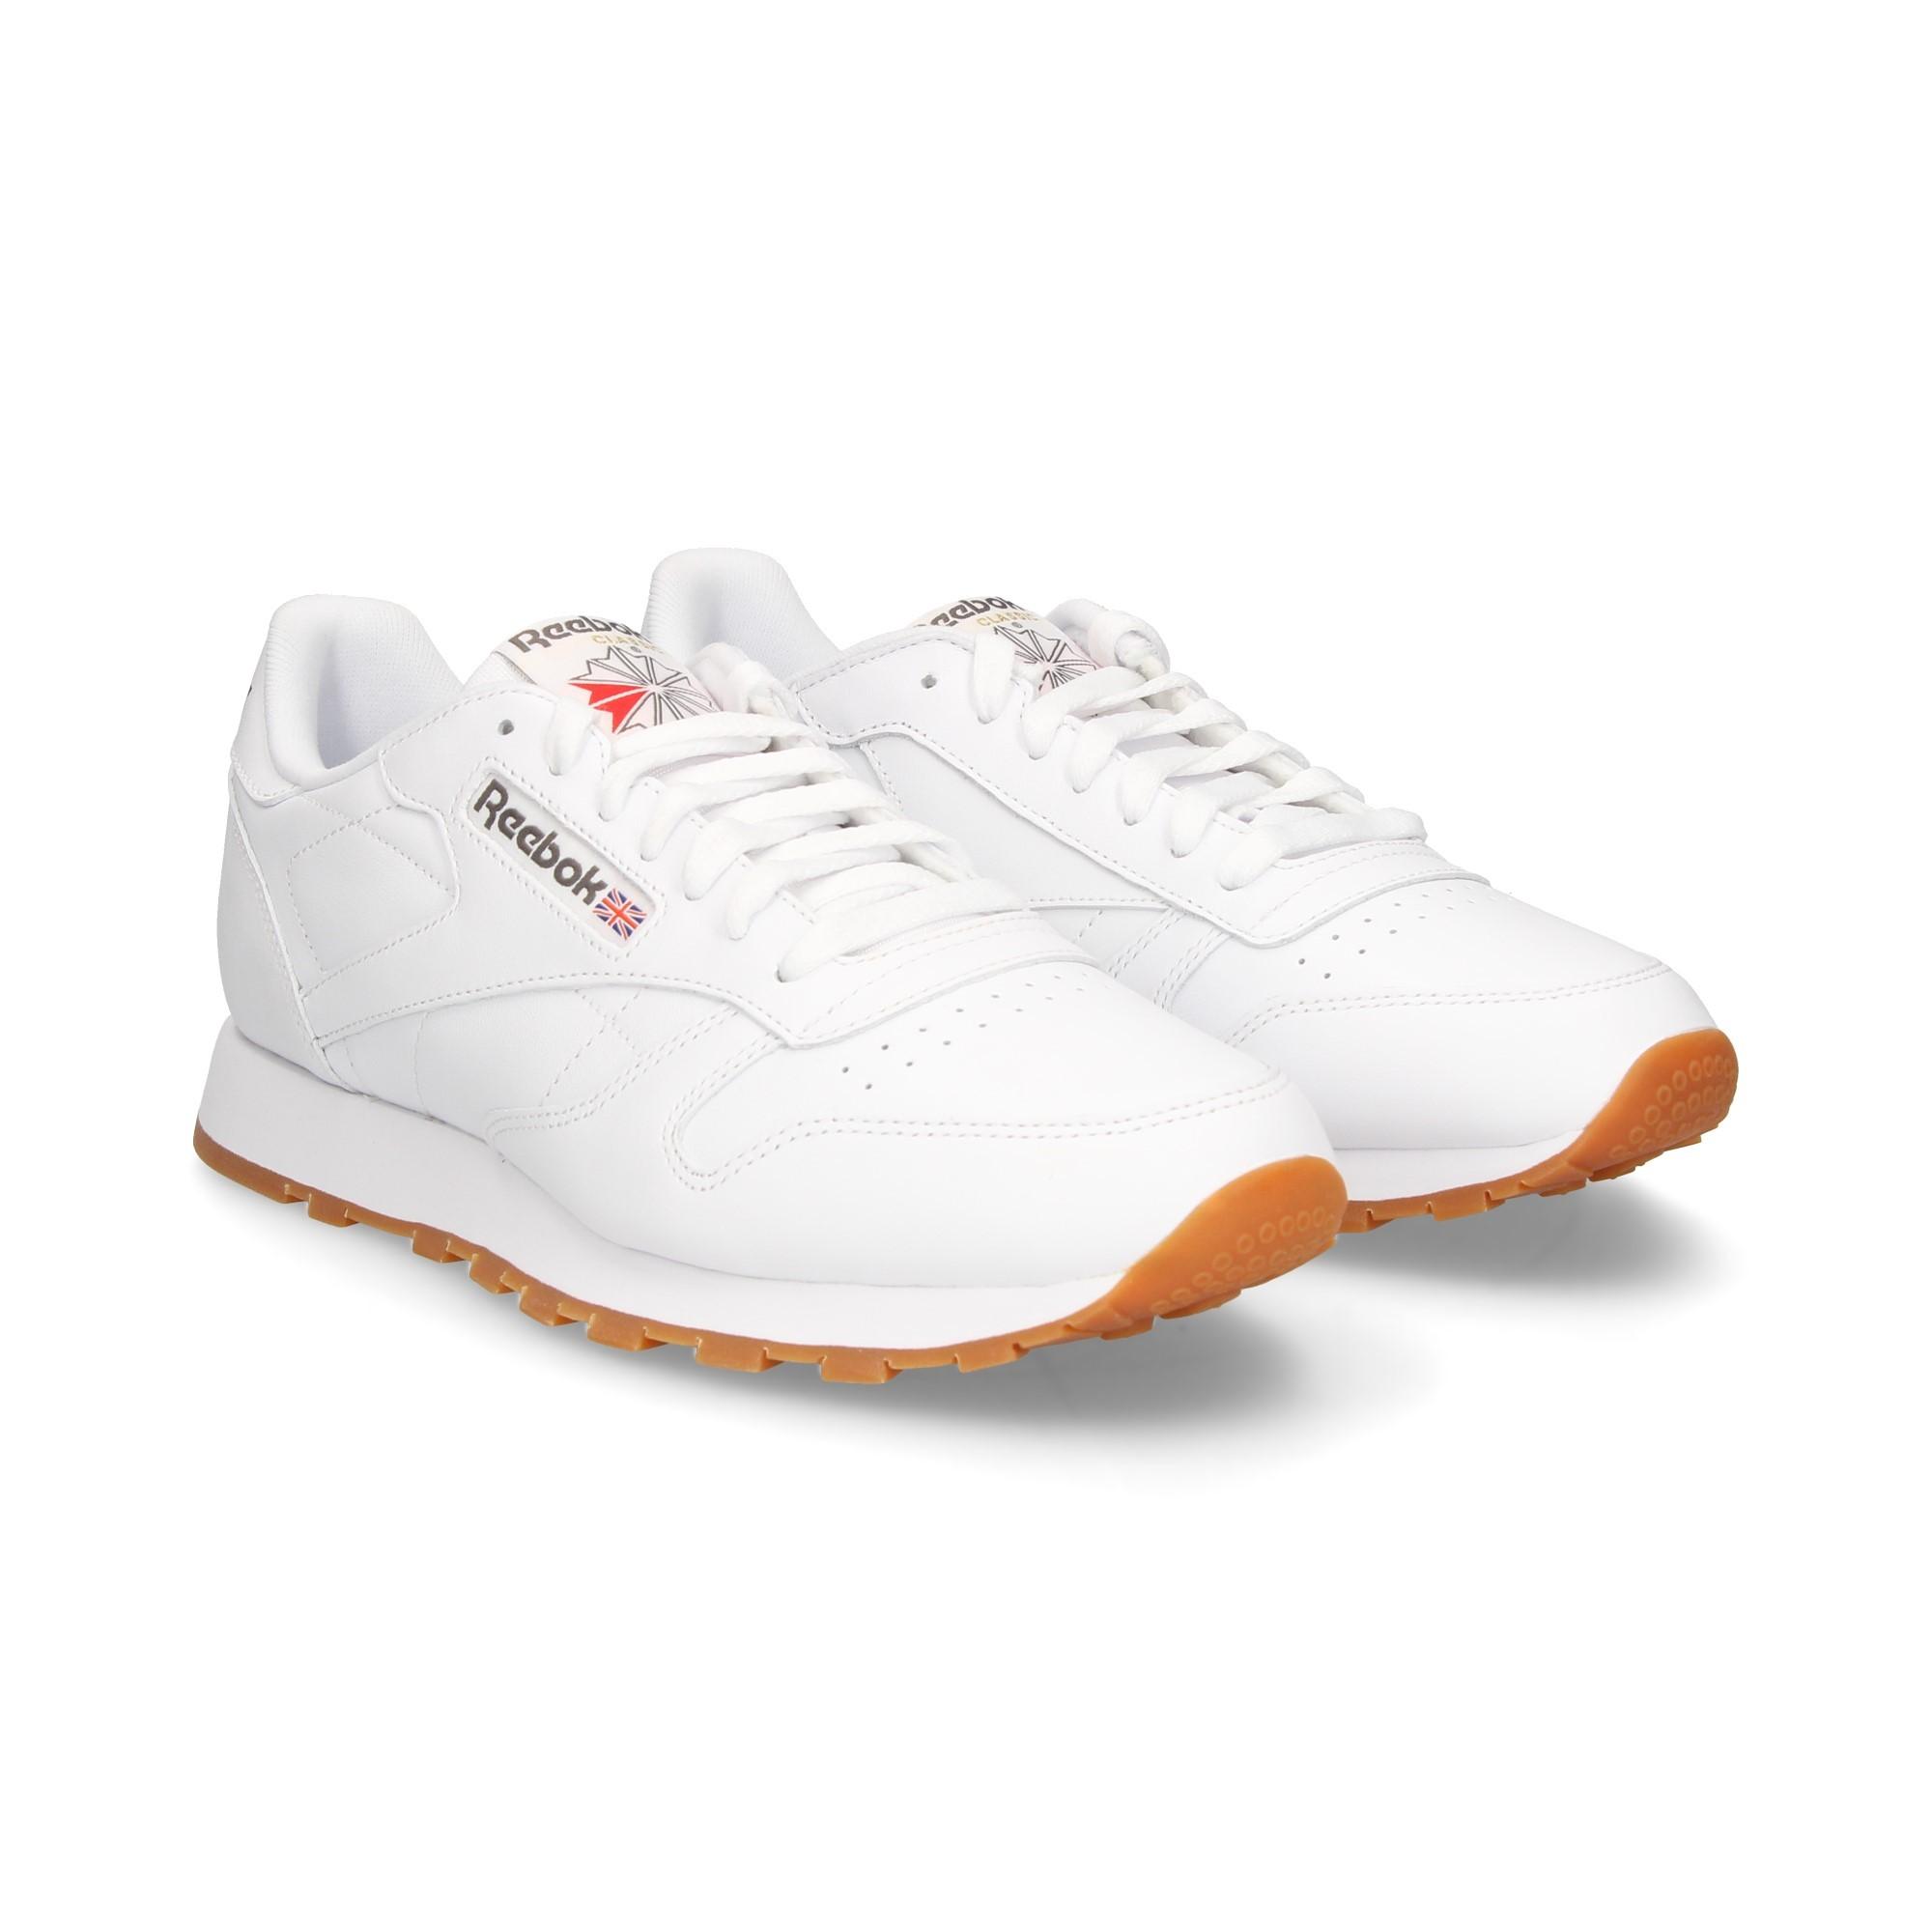 REEBOK Men's sneakers 49799 WHTGUM